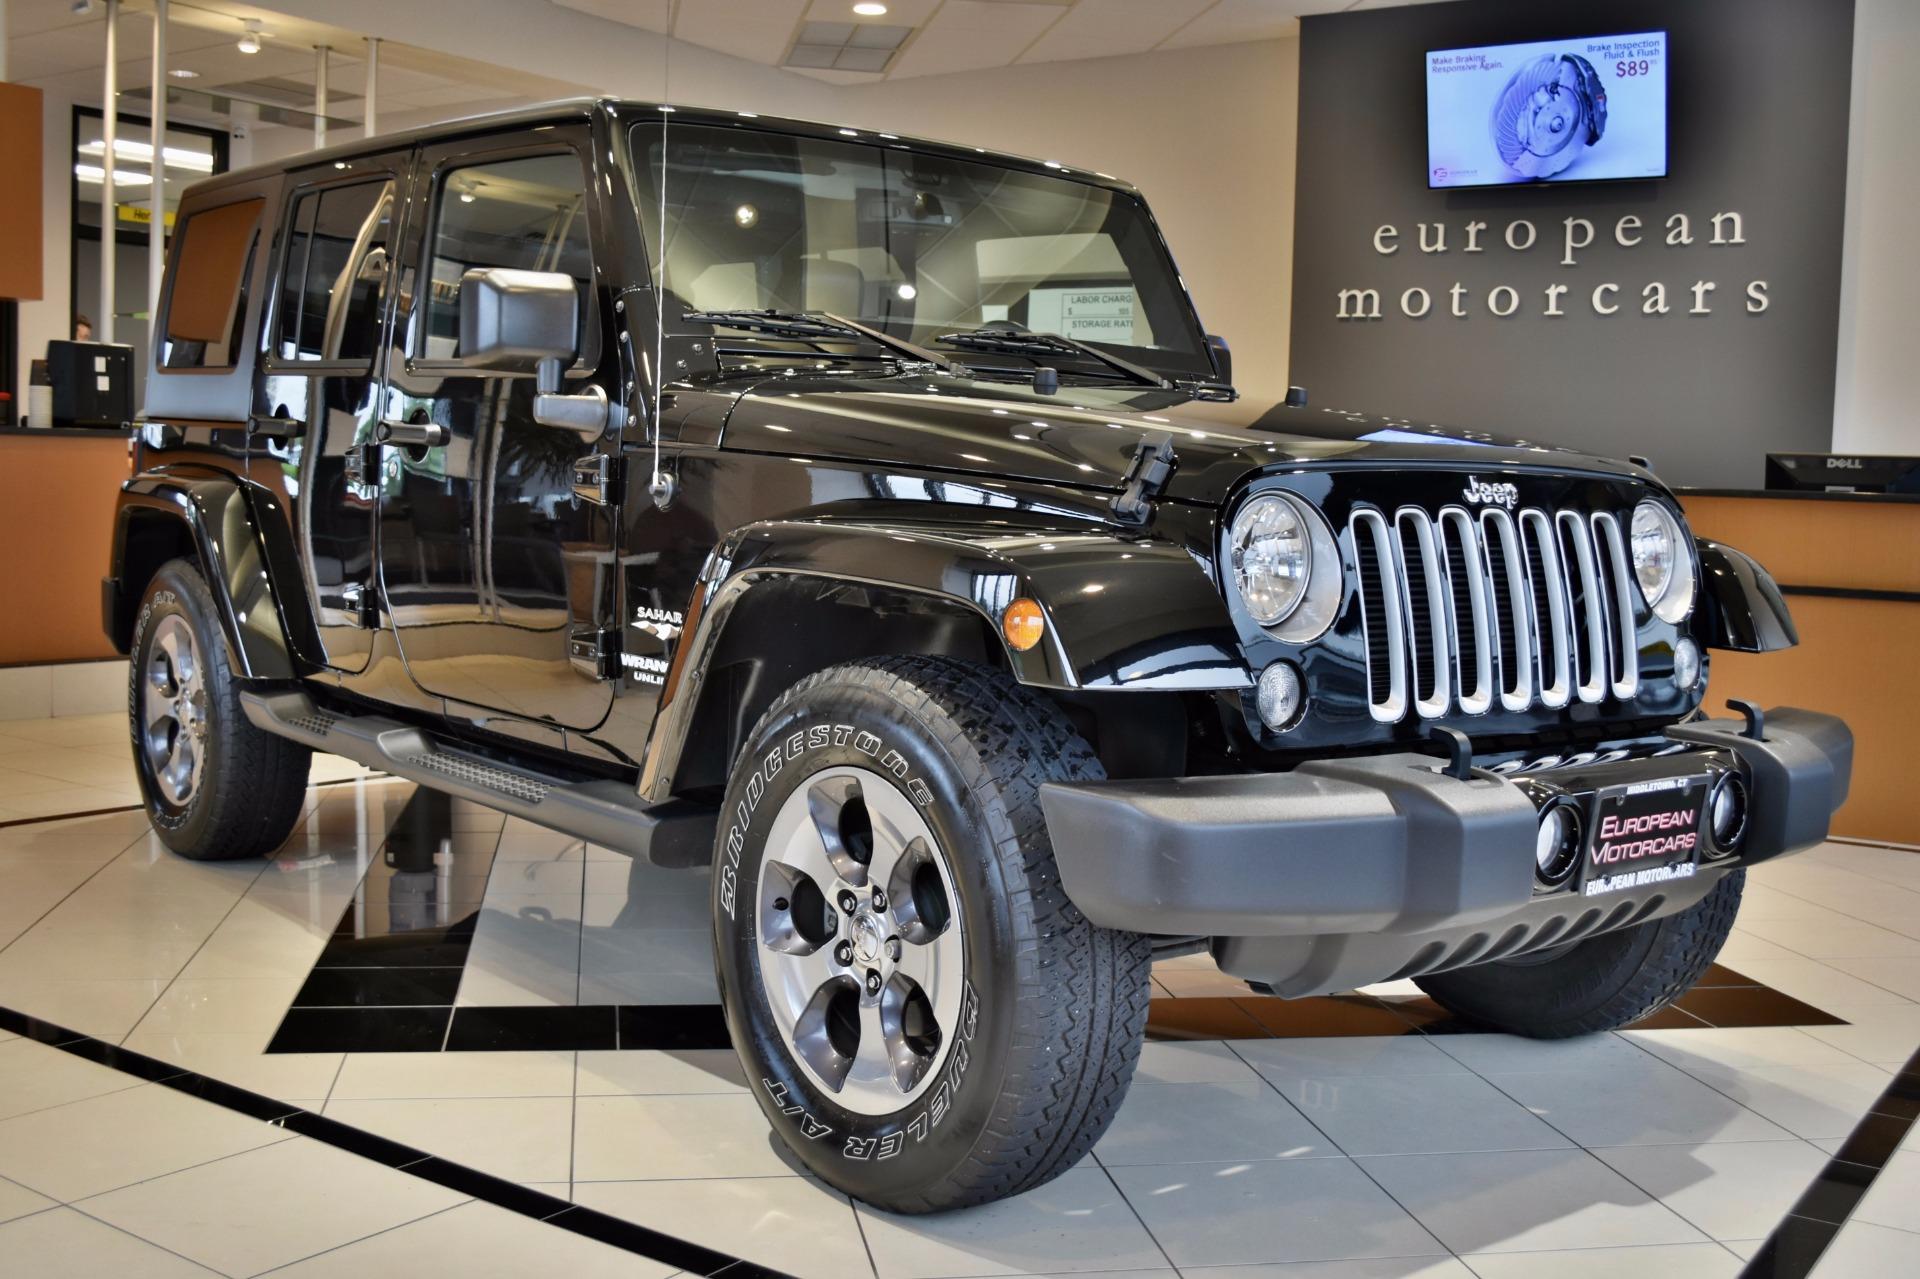 2016 jeep wrangler unlimited sahara for sale near middletown ct ct jeep dealer stock 202739. Black Bedroom Furniture Sets. Home Design Ideas